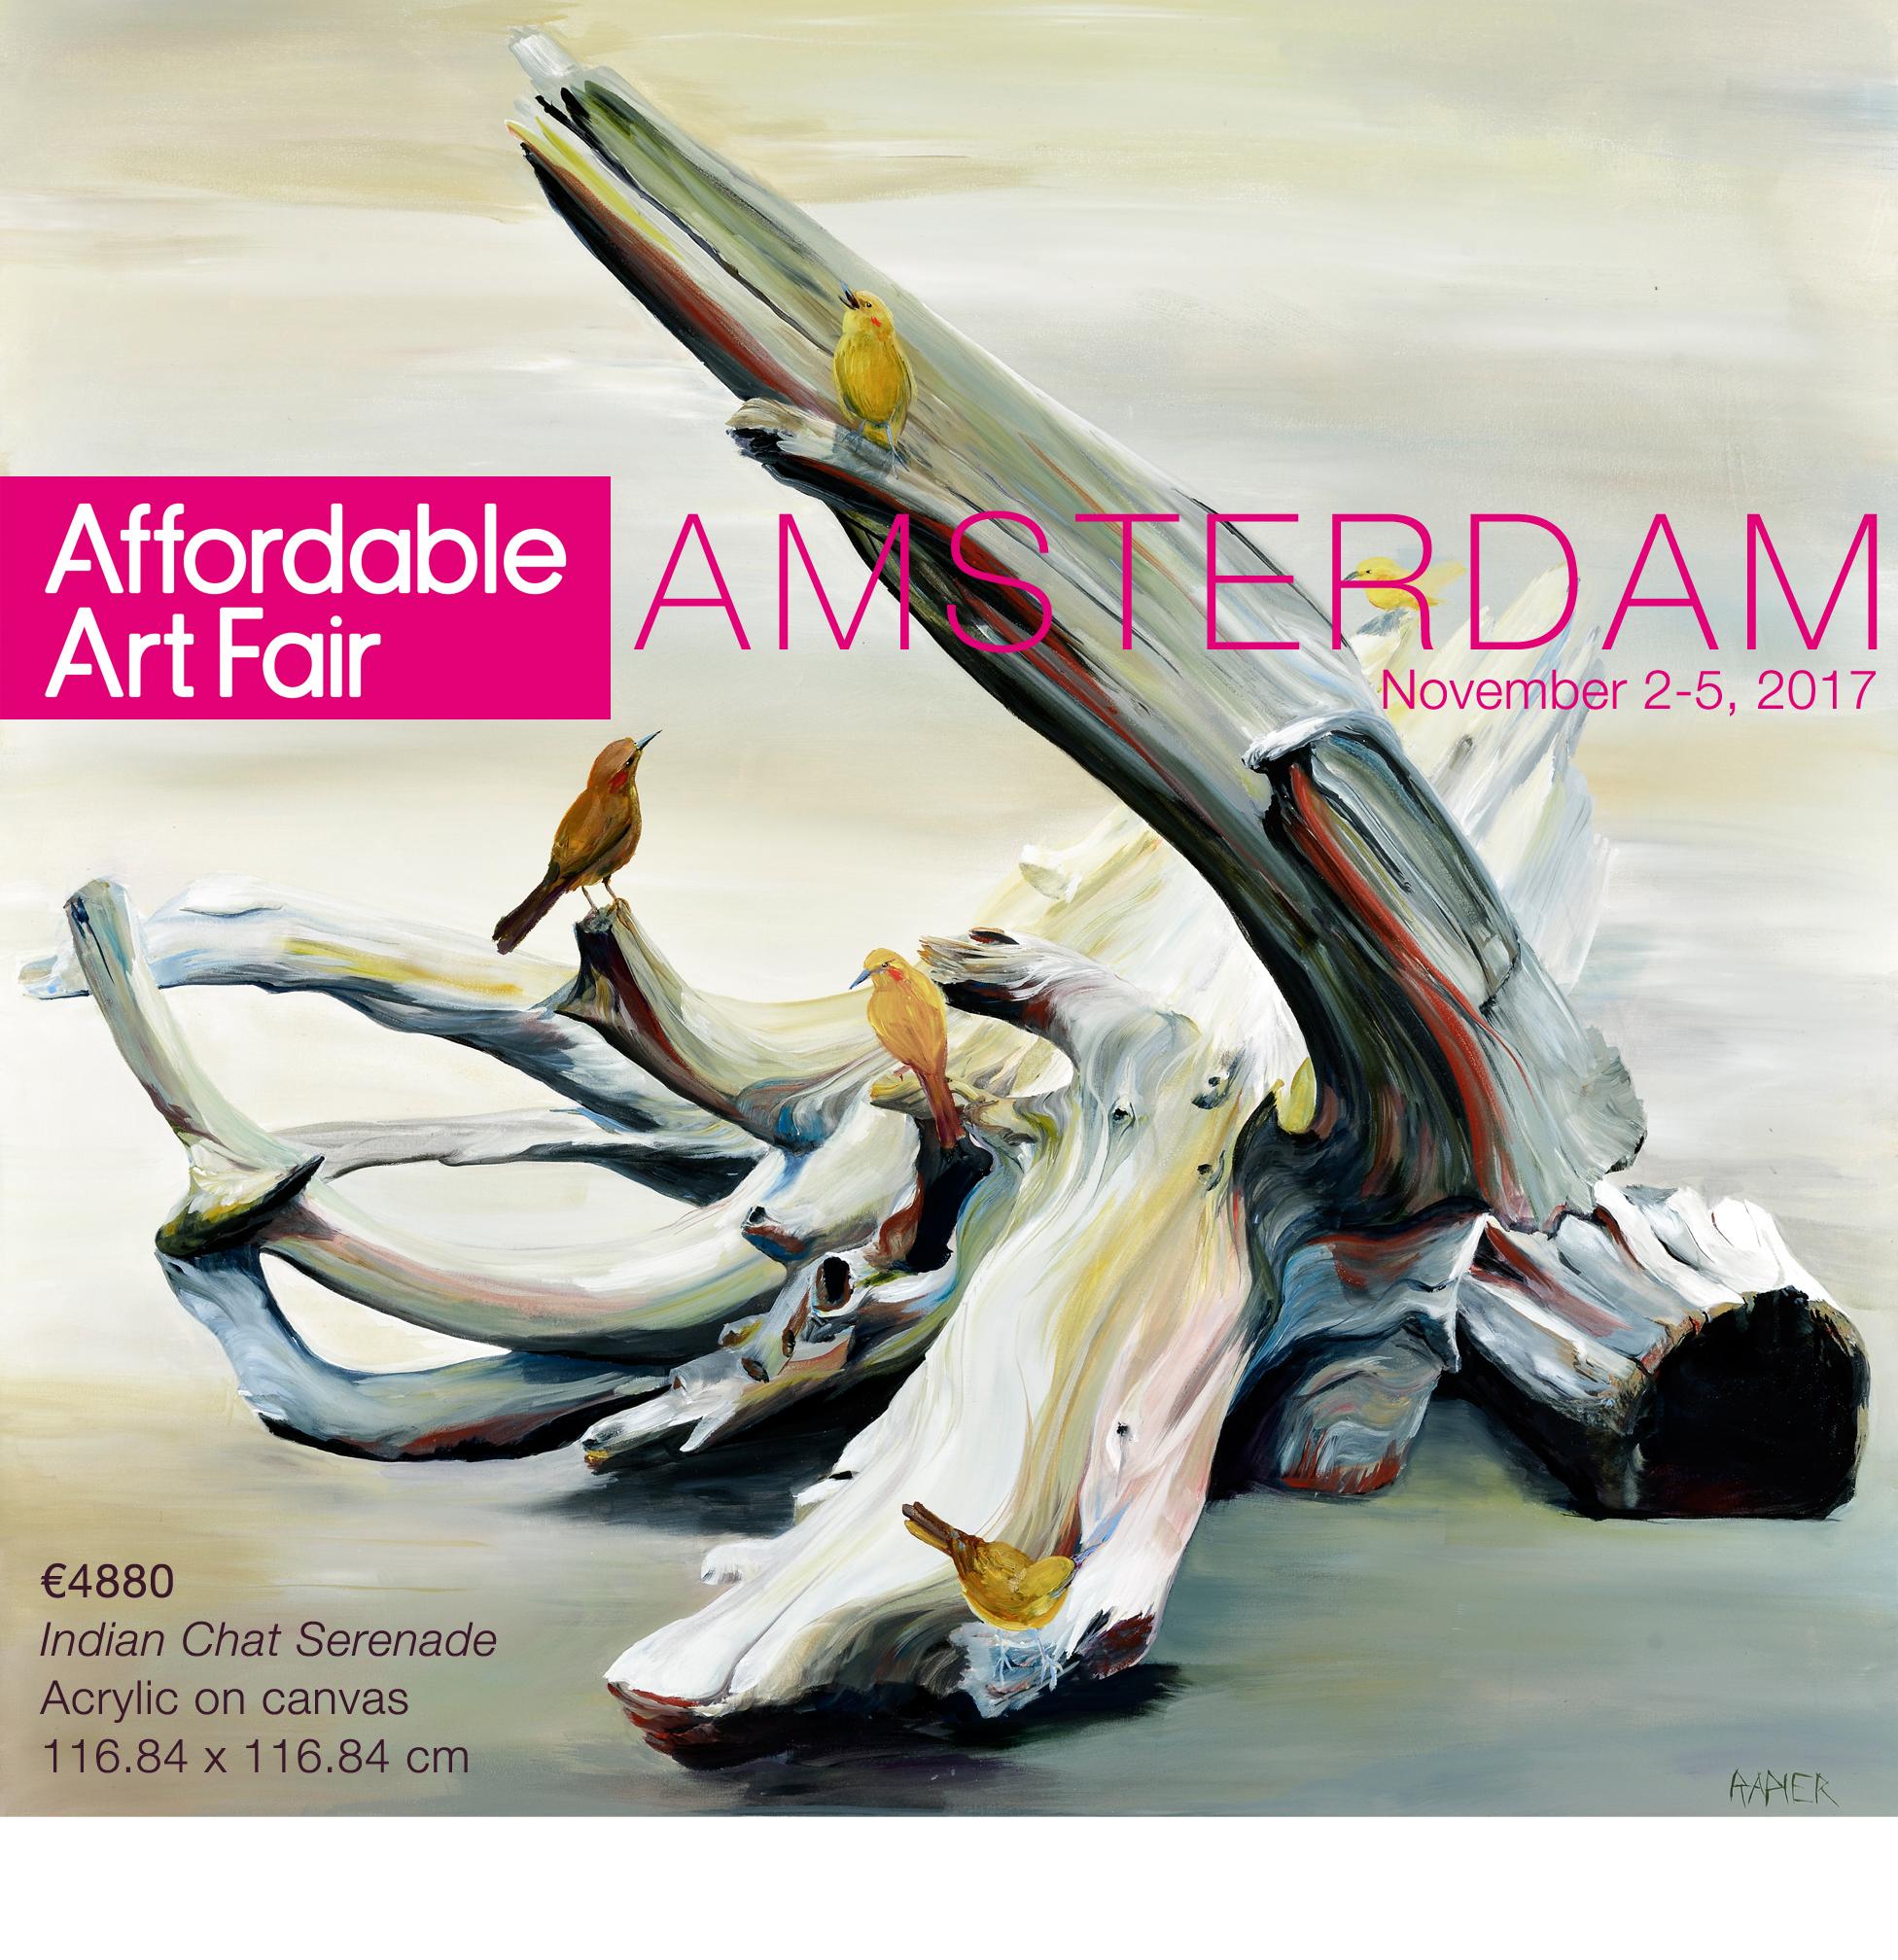 AMsterdam_events_1.jpg